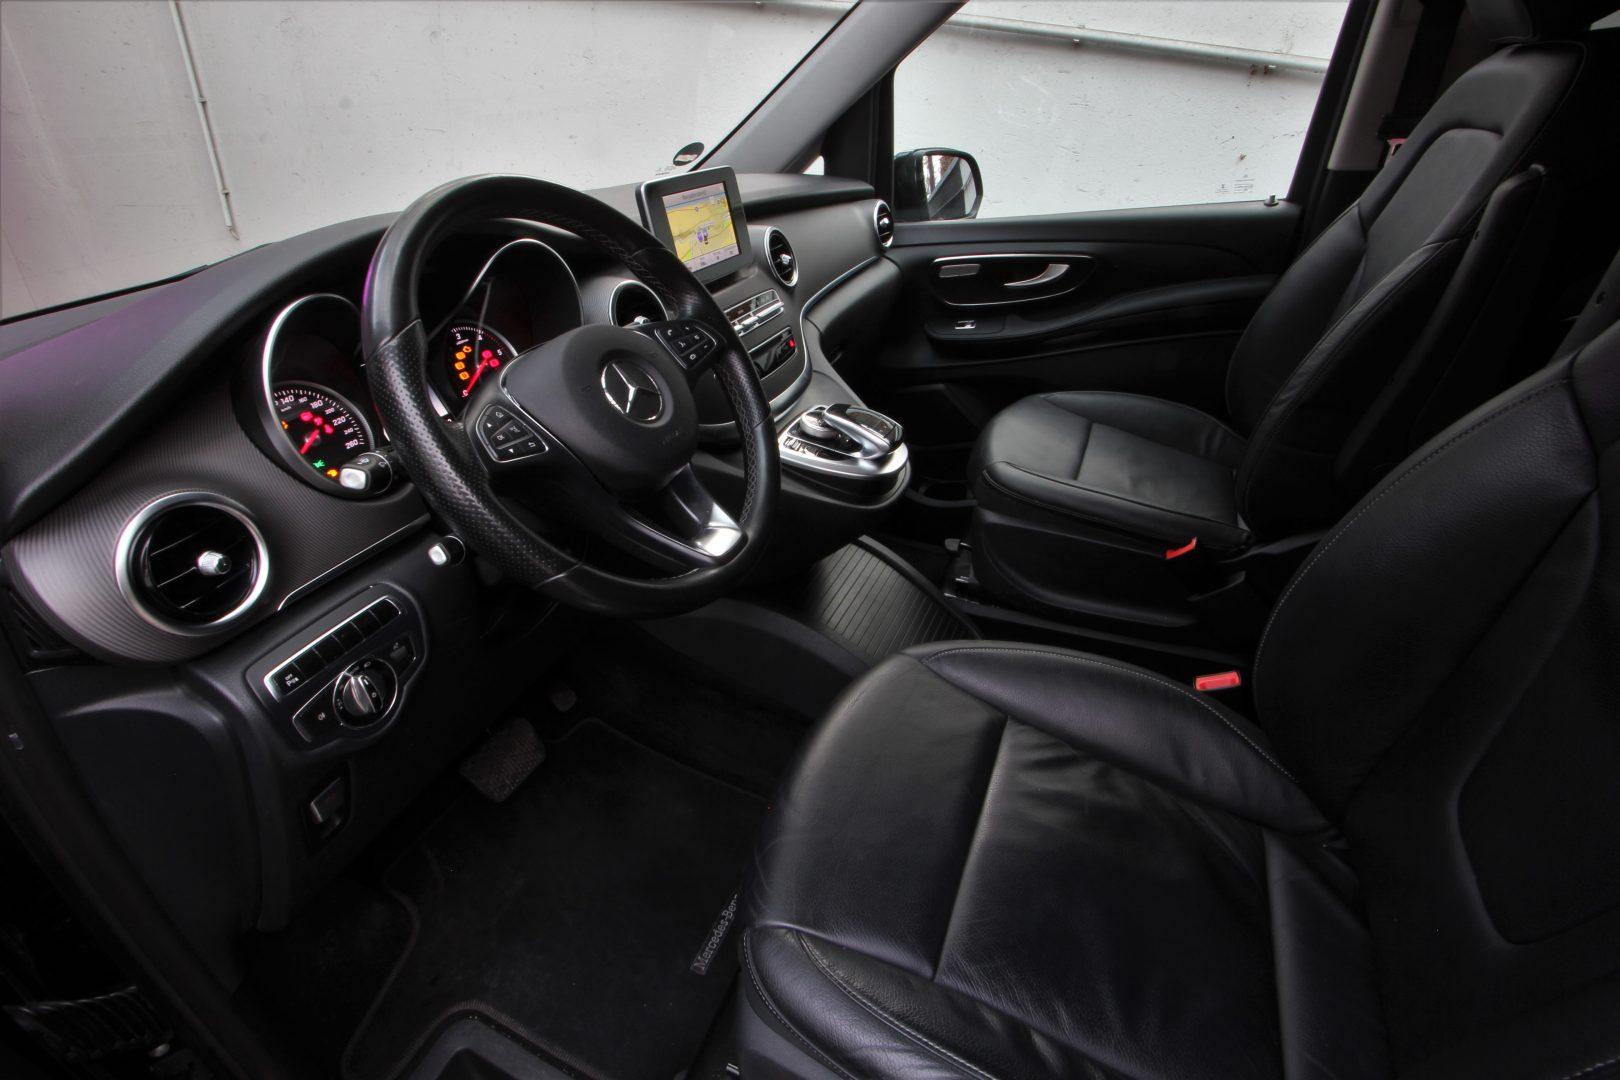 AIL Mercedes-Benz V 250 CDI/BT/d AVANTGARD LED  9